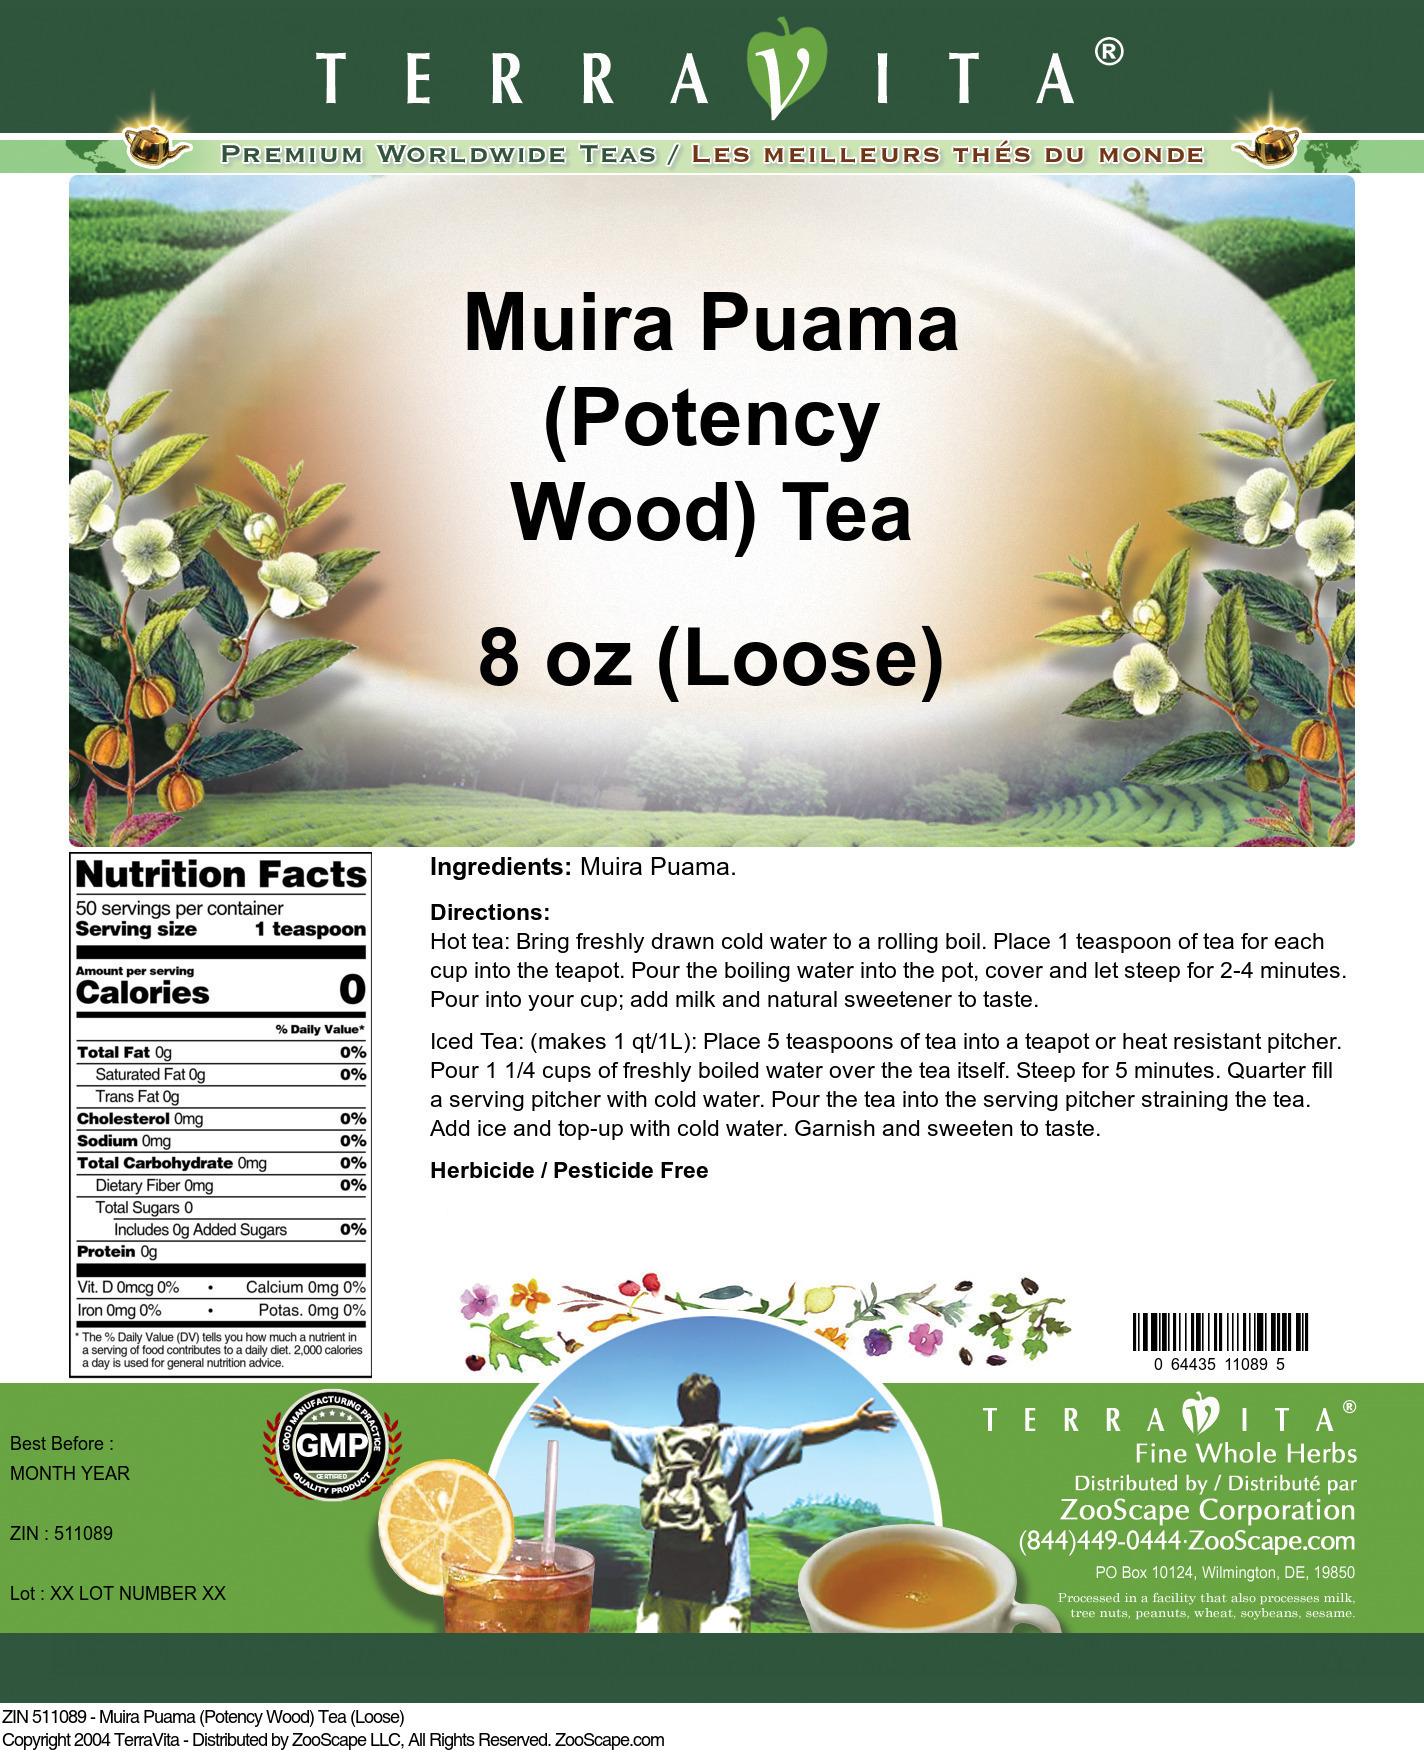 Muira Puama (Potency Wood) Tea (Loose)